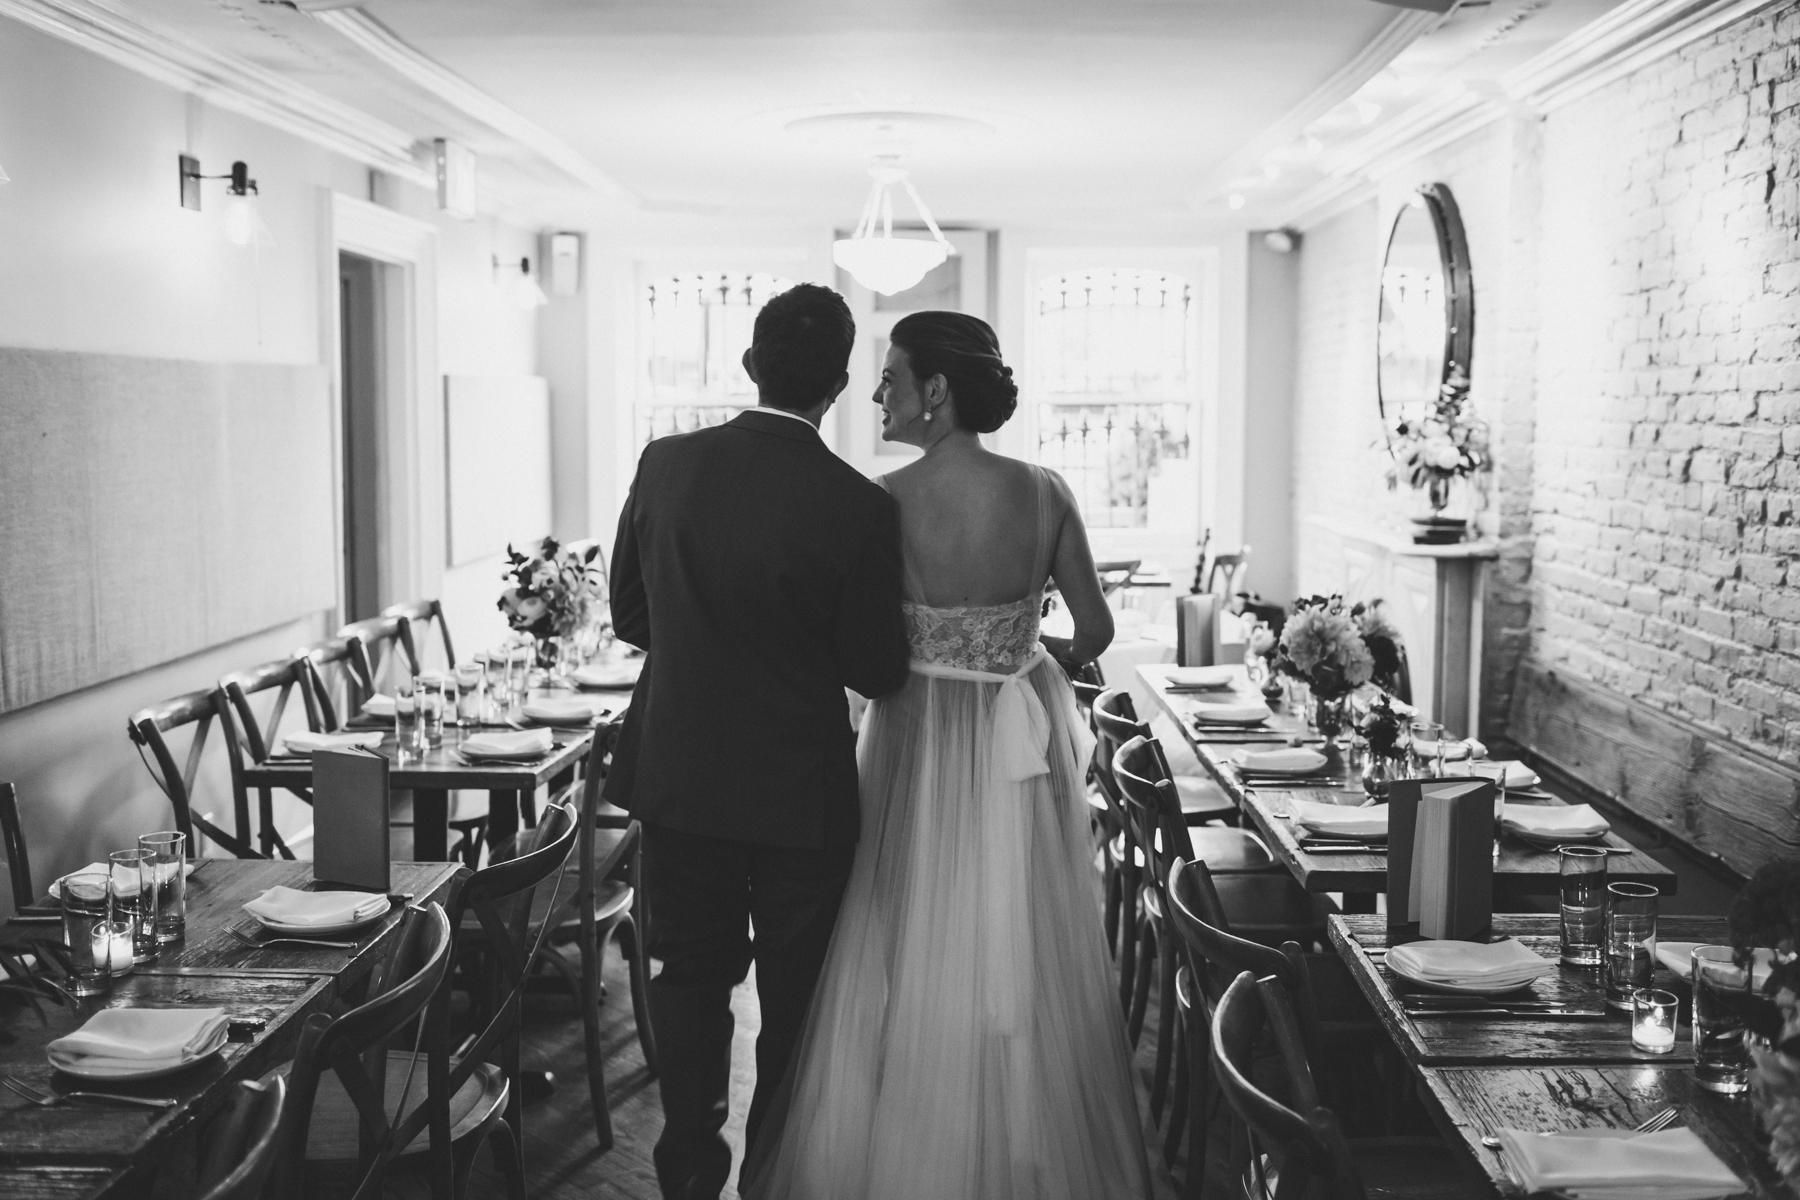 ICI-Restaurant-Fort-Greene-Brooklyn-Intimate-Documentary-Wedding-Photography-Elvira-Kalviste-47.jpg